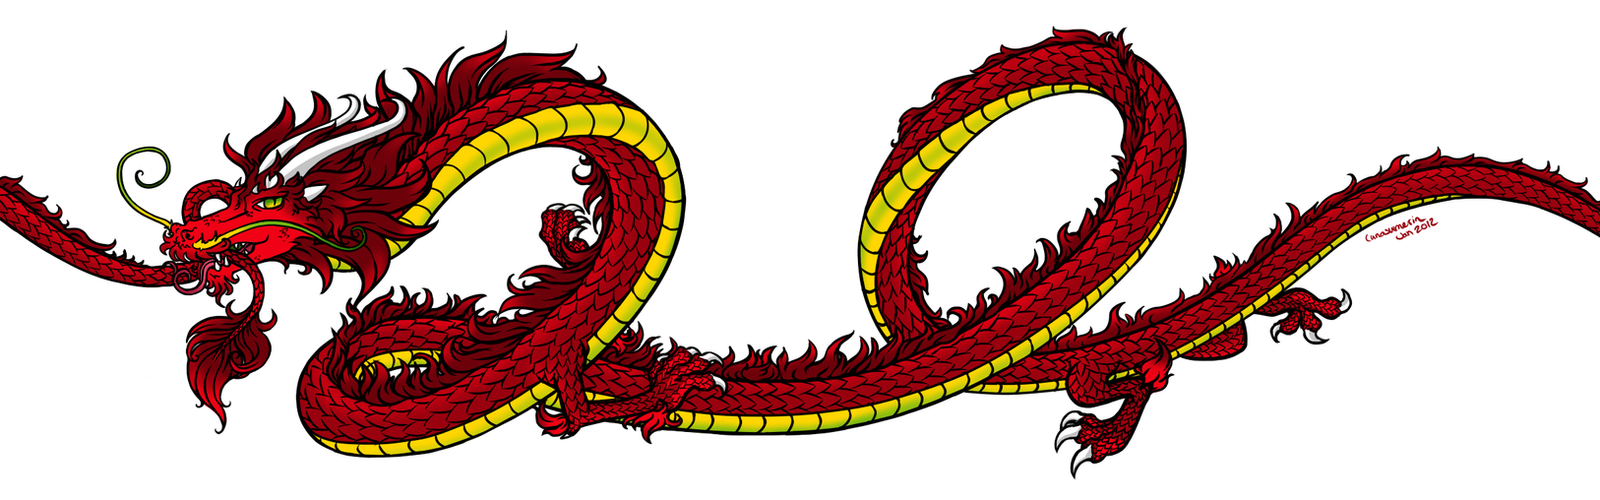 Dragon Tattoo Design by Lunasumerin